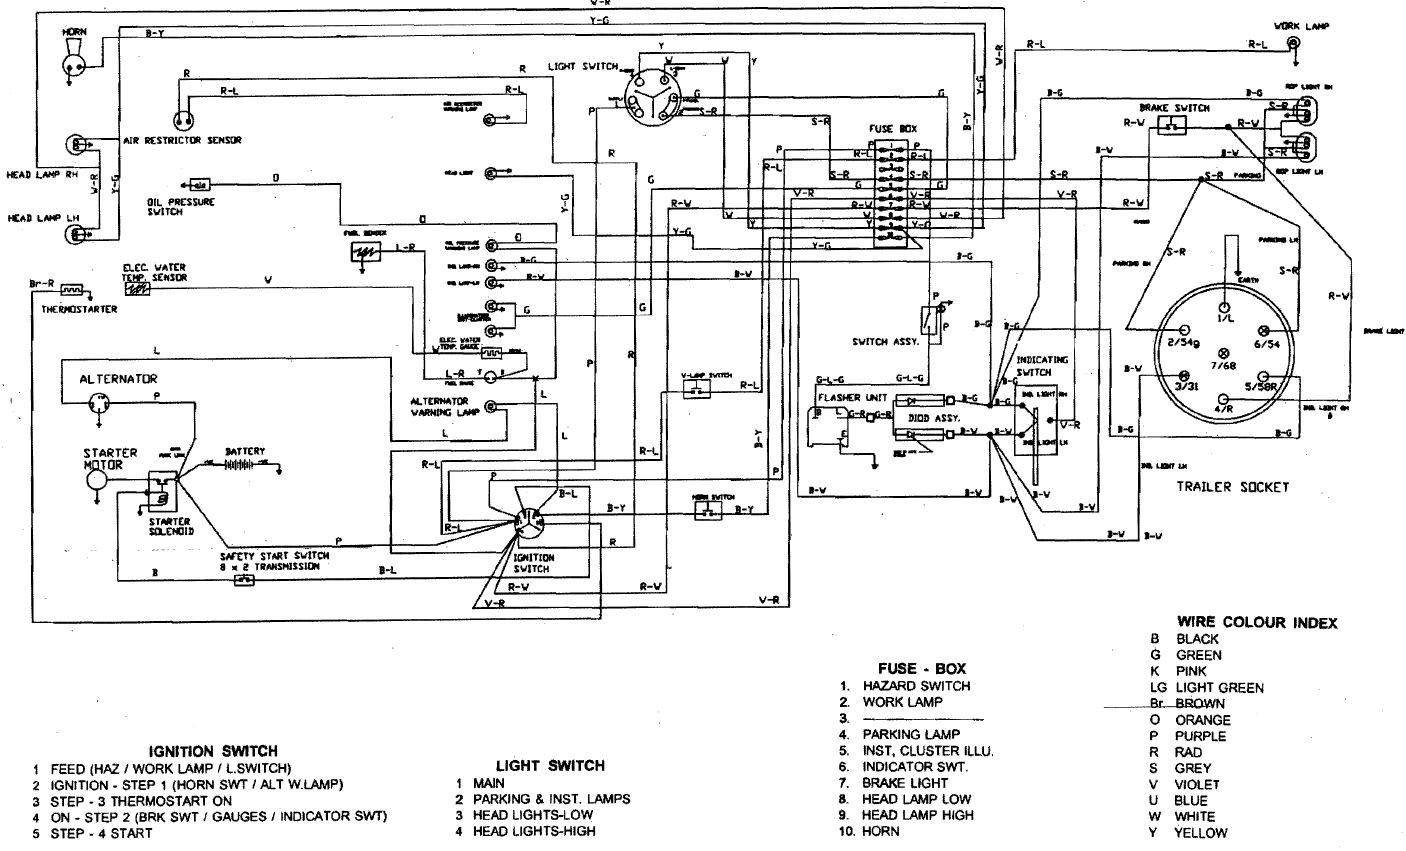 Kubota Tractor L4330 Diesel Ignition Switch Wiring Diagram